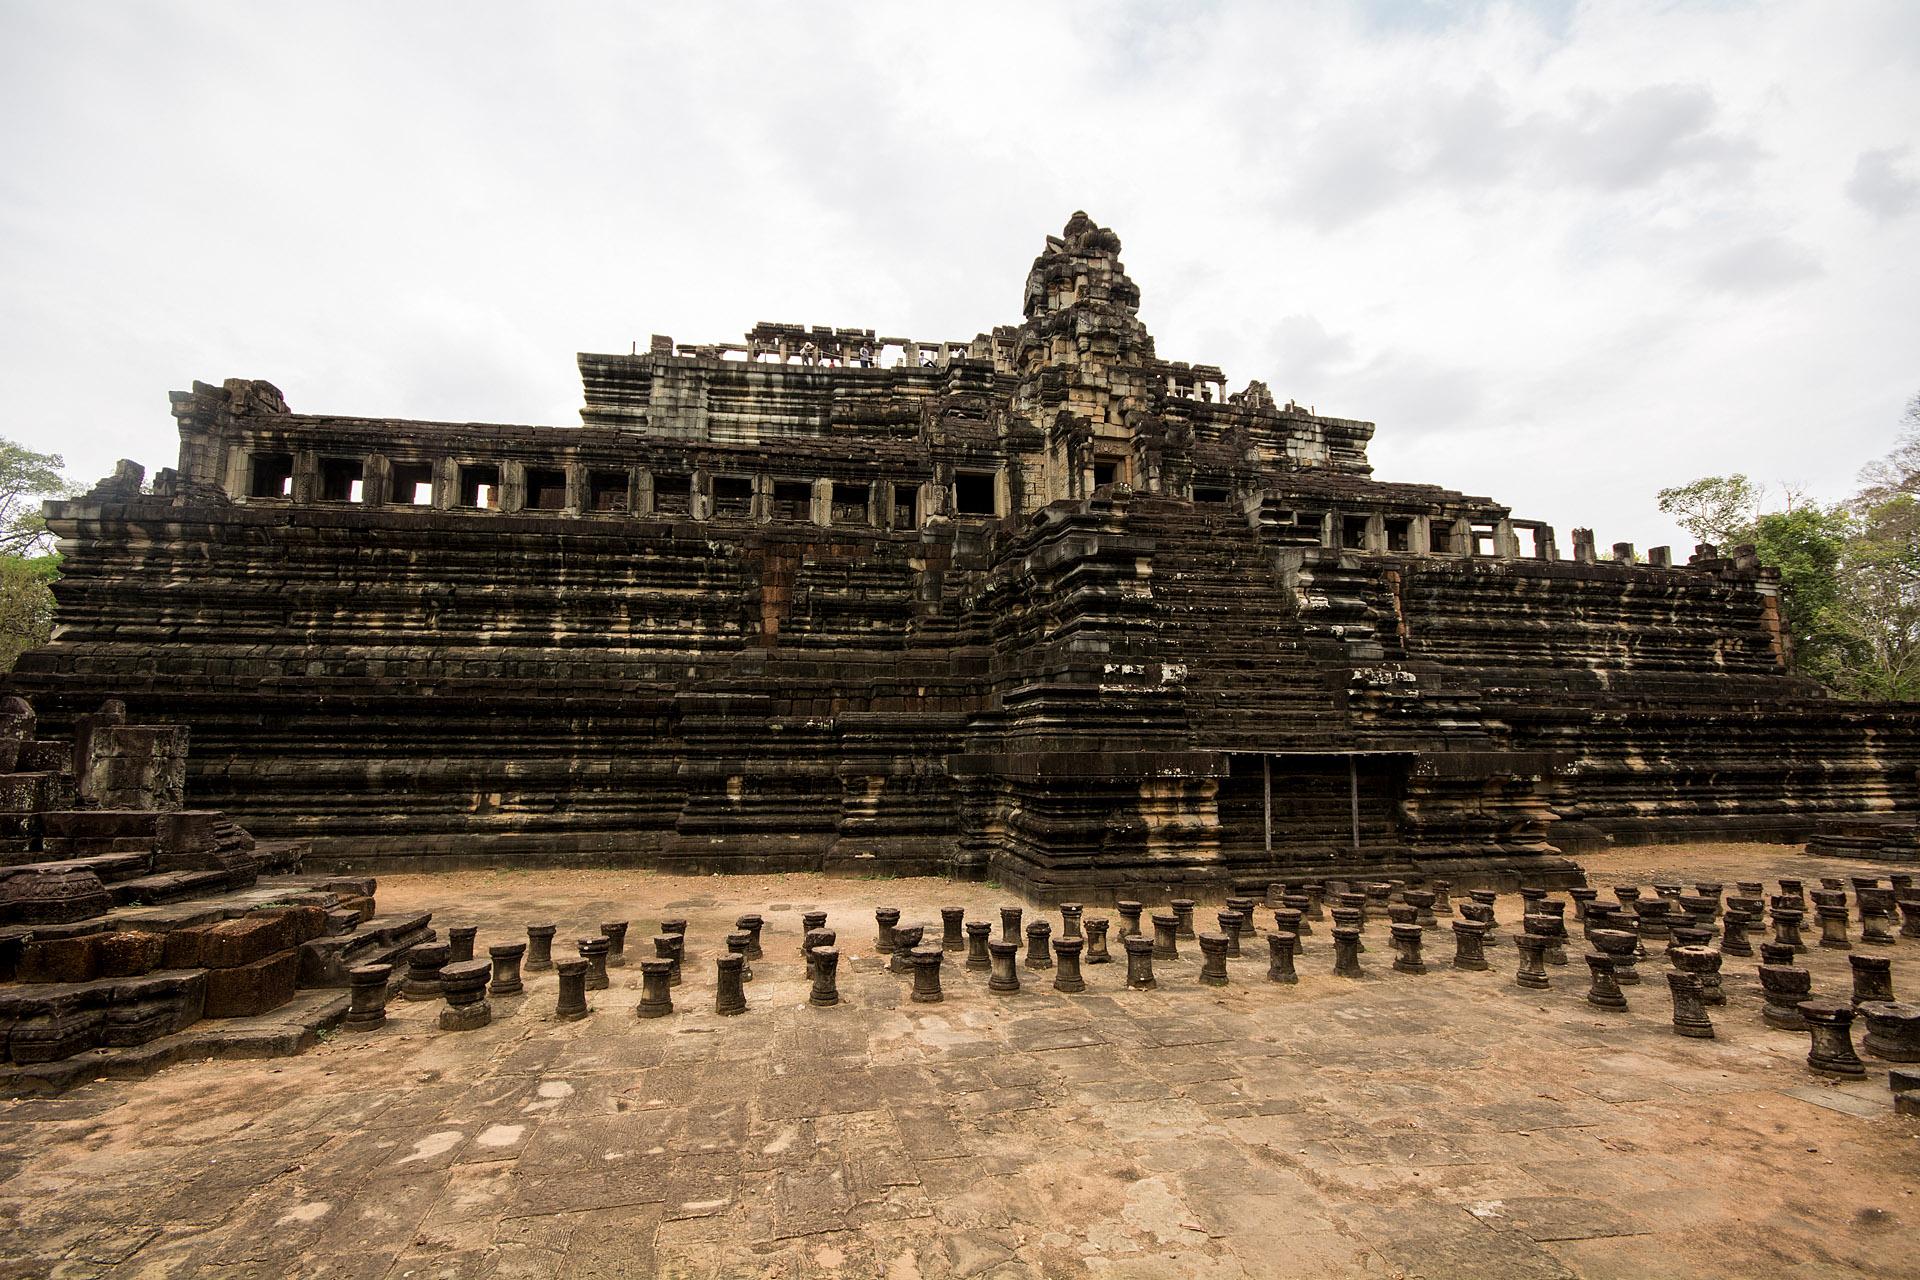 Bapuon (Angkor Thom)